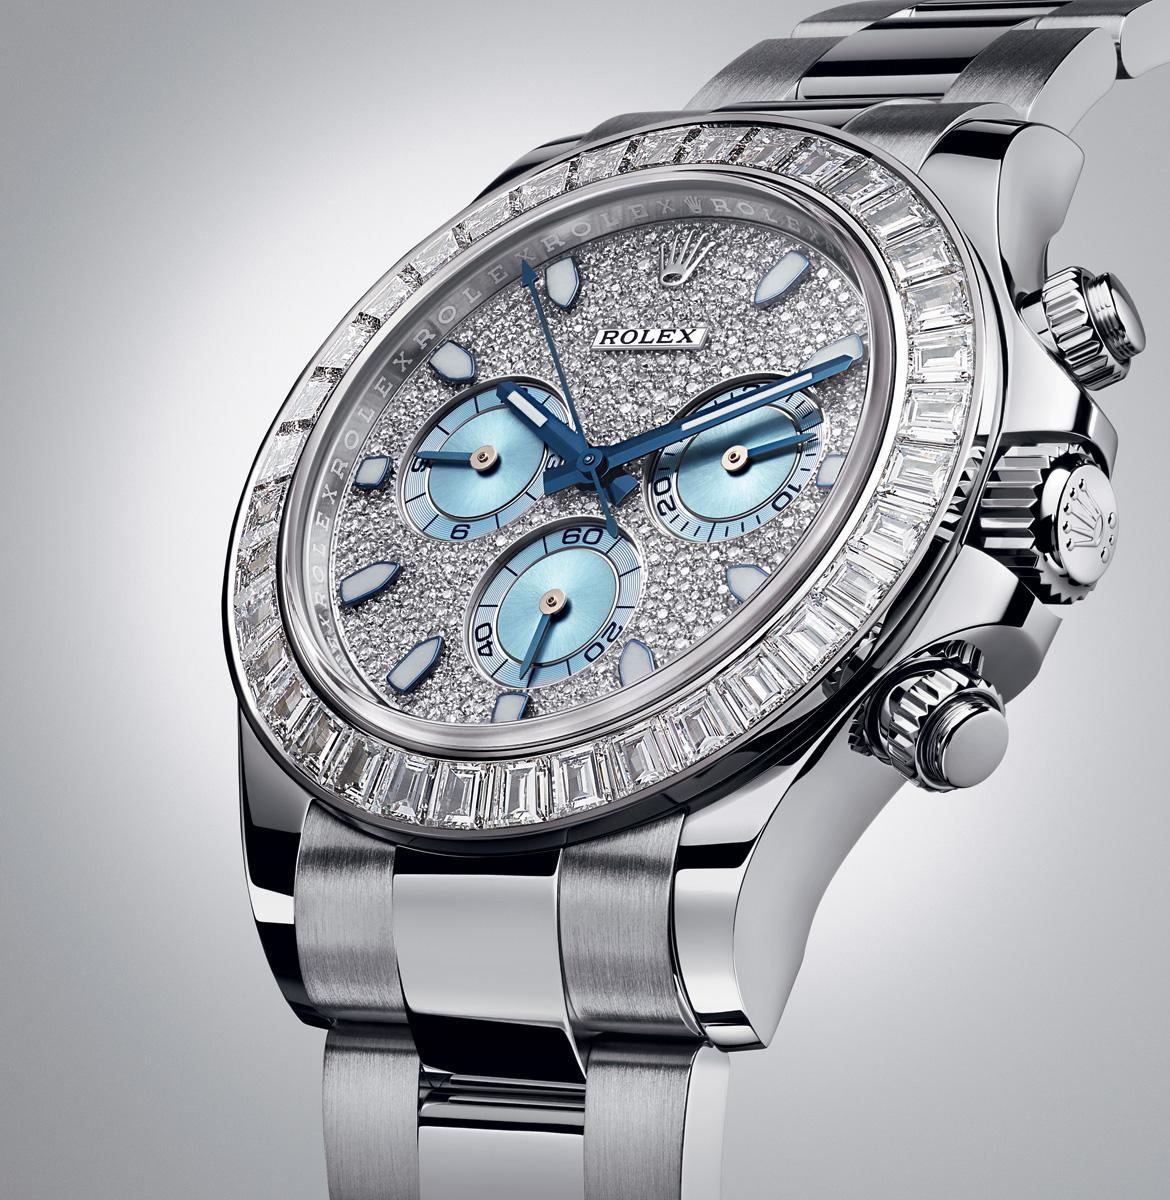 Baselworld 2014 Introducing the Rolex Daytona Platinum with